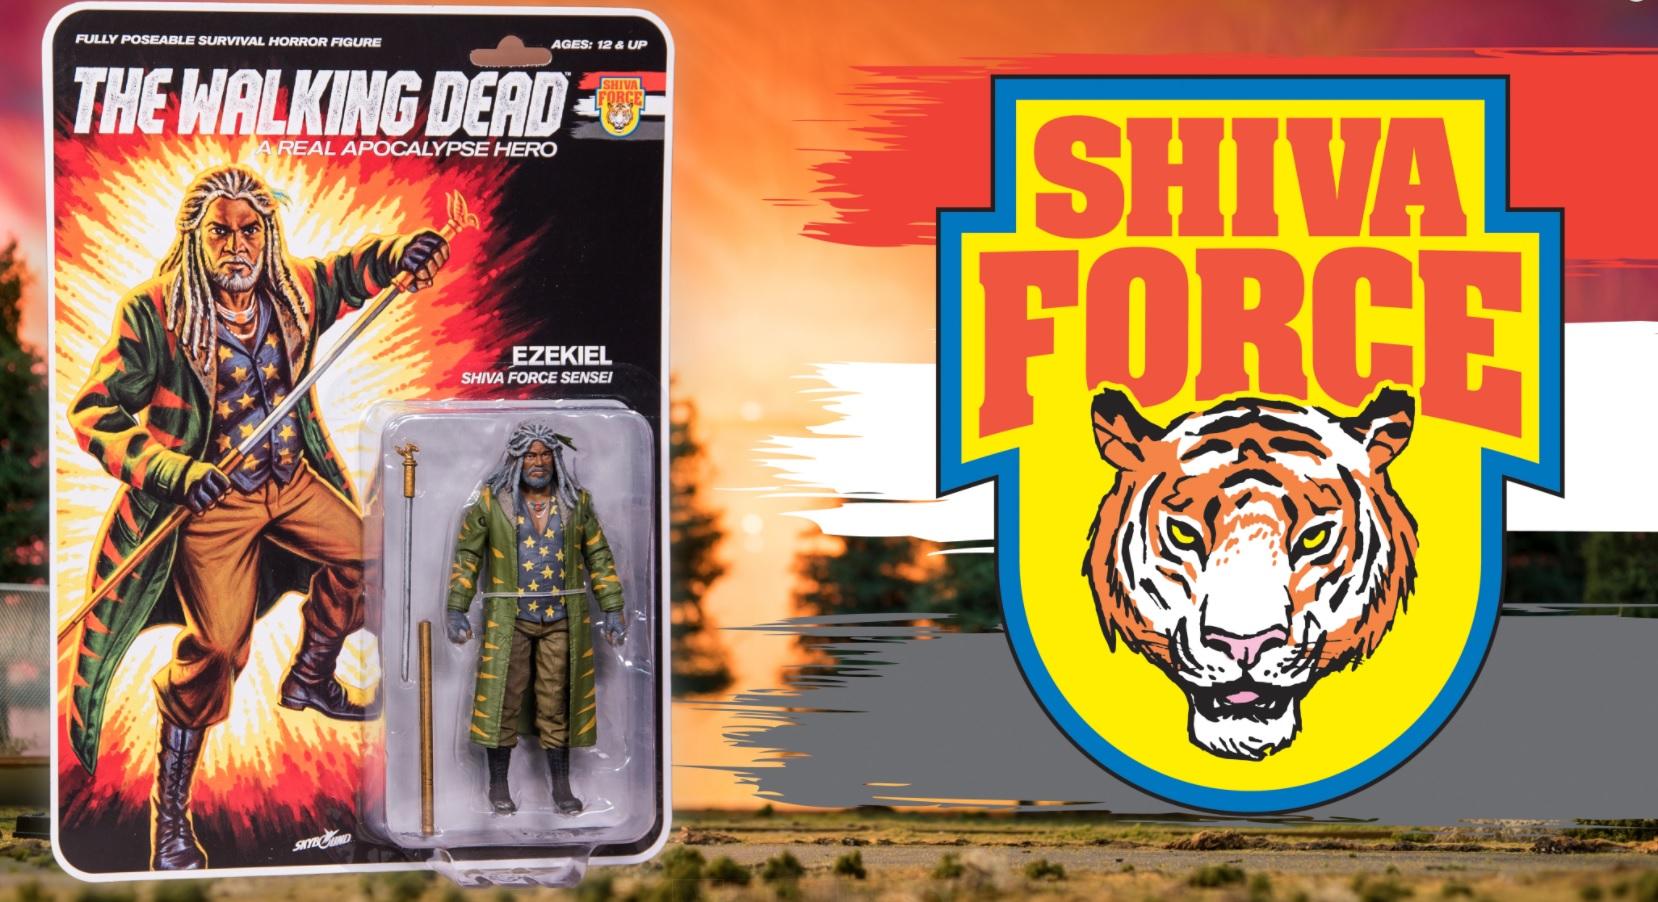 Shiva Force THE WALKING DEAD A Real Apocalypse Hero RICK Commander GI JOE Style